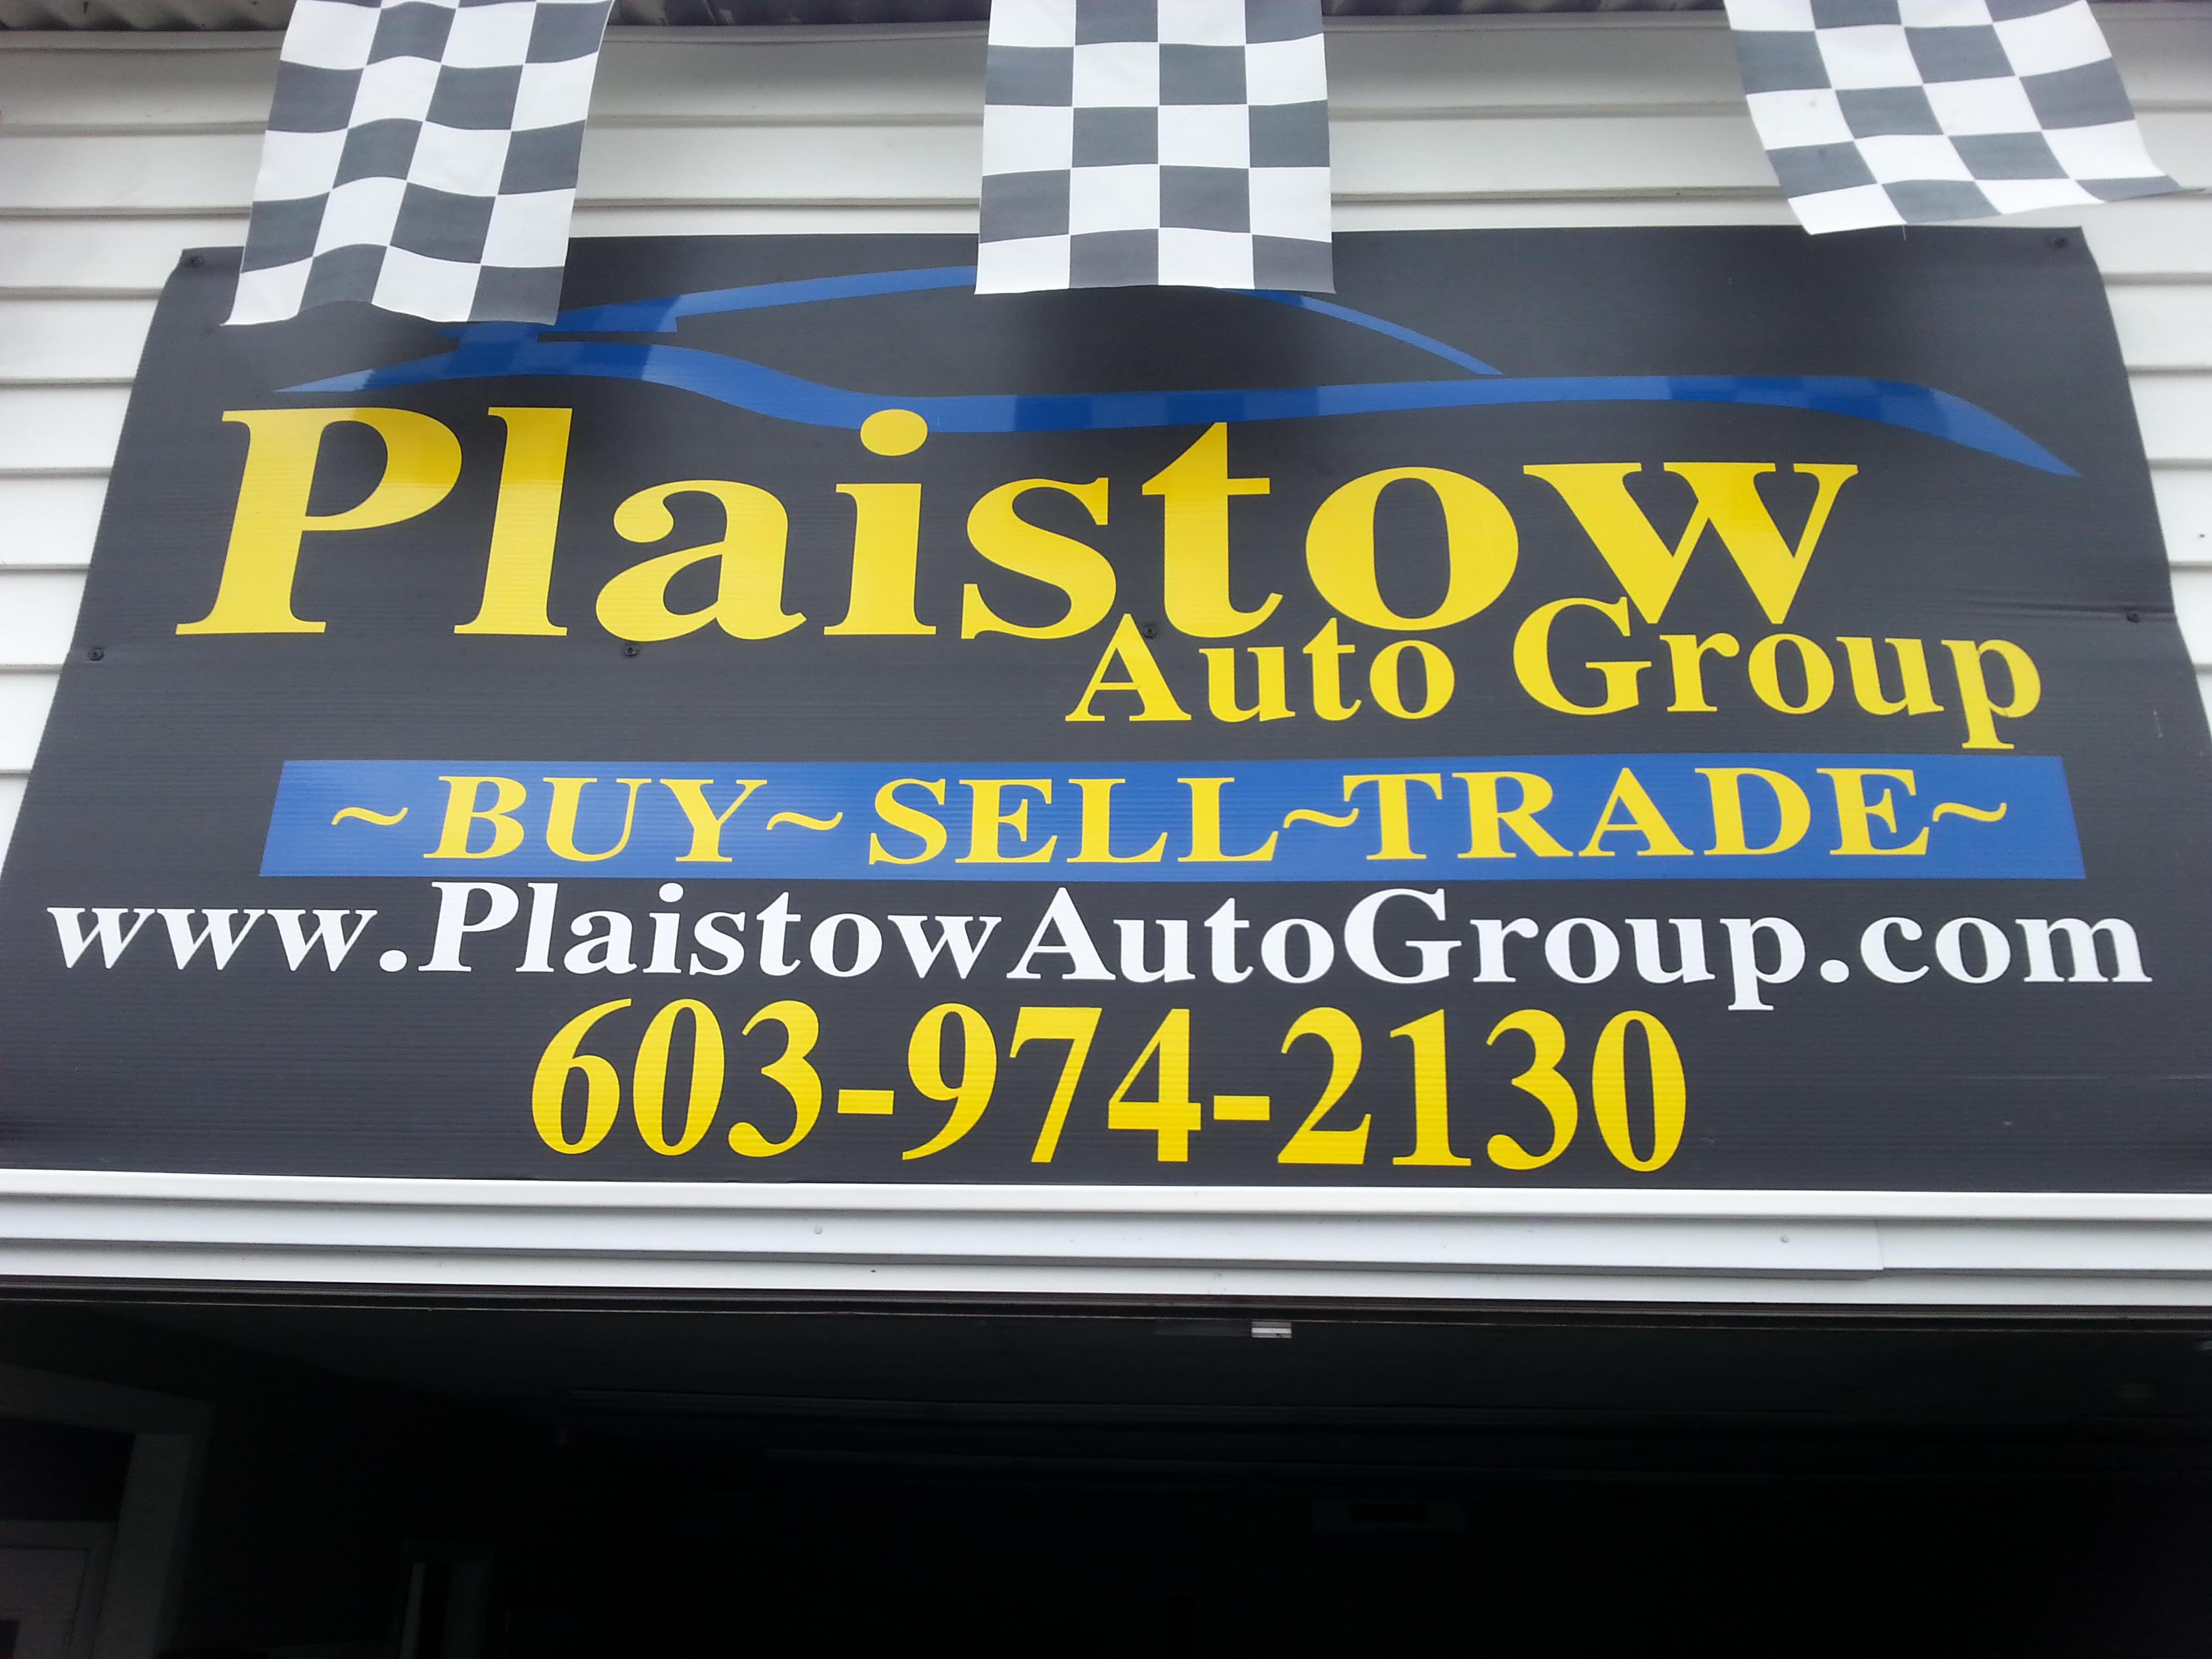 Plaistow Auto Group, Plaistow NH